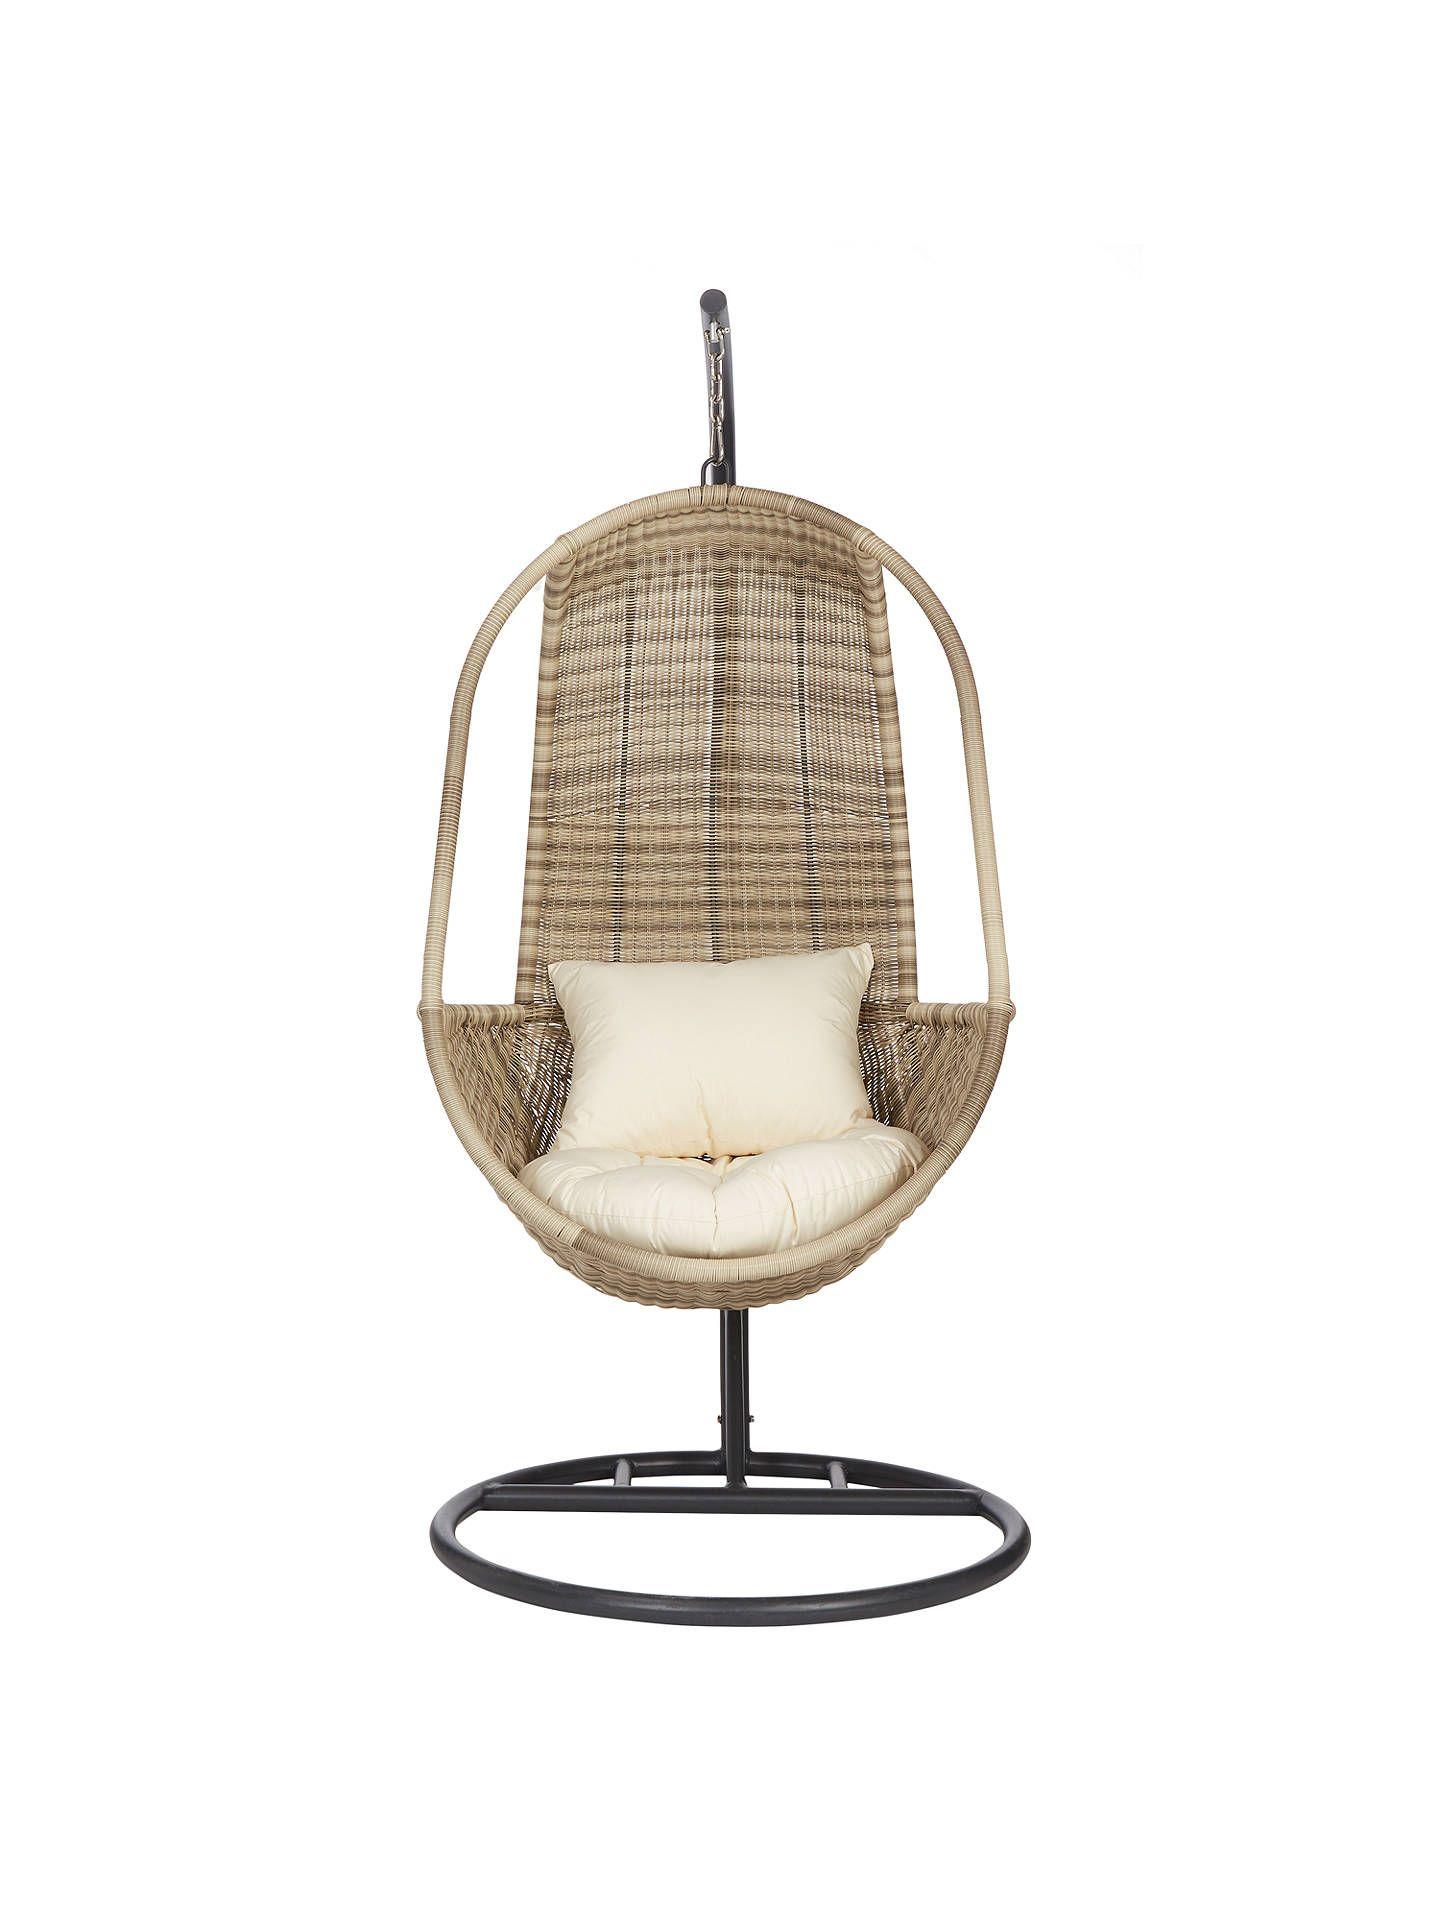 John Lewis Partners Dante Pod Hanging Chair Natural Hanging Chair Pod Chair Hanging Chair Outdoor